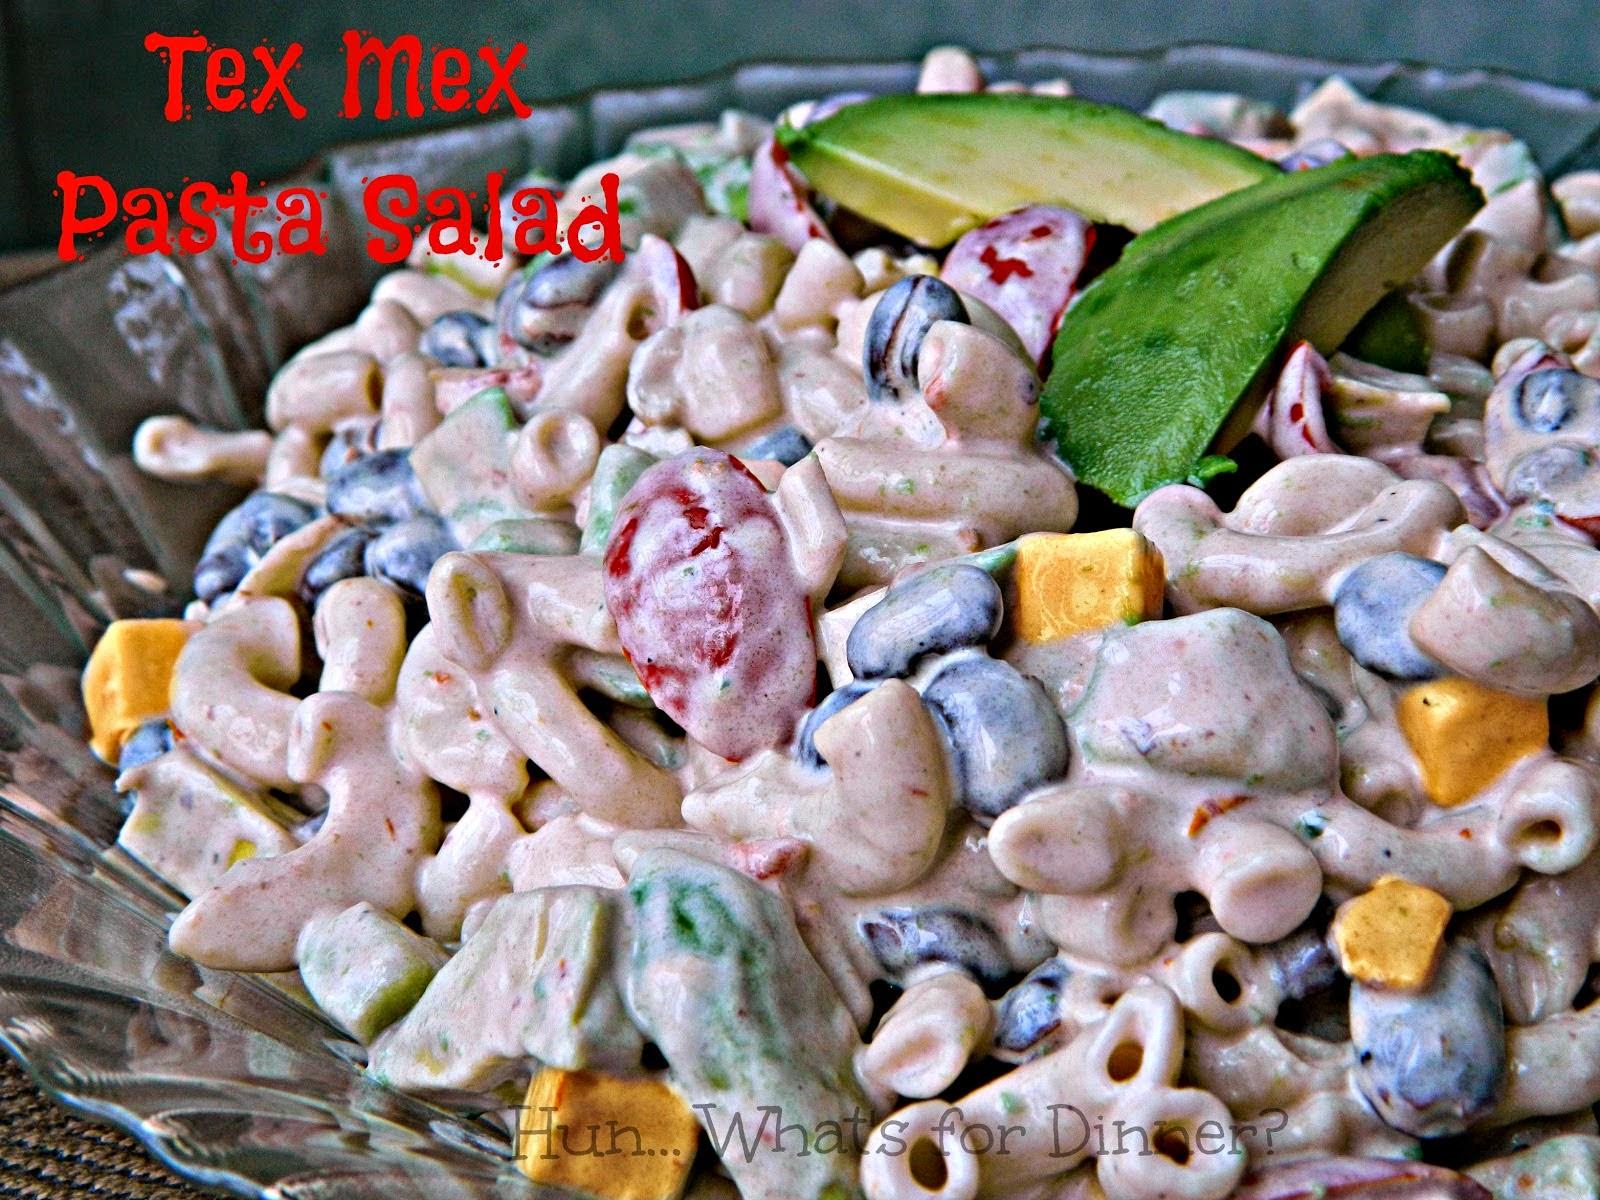 http://www.hunwhatsfordinner.com/2014/06/tex-mex-pasta-salad.html